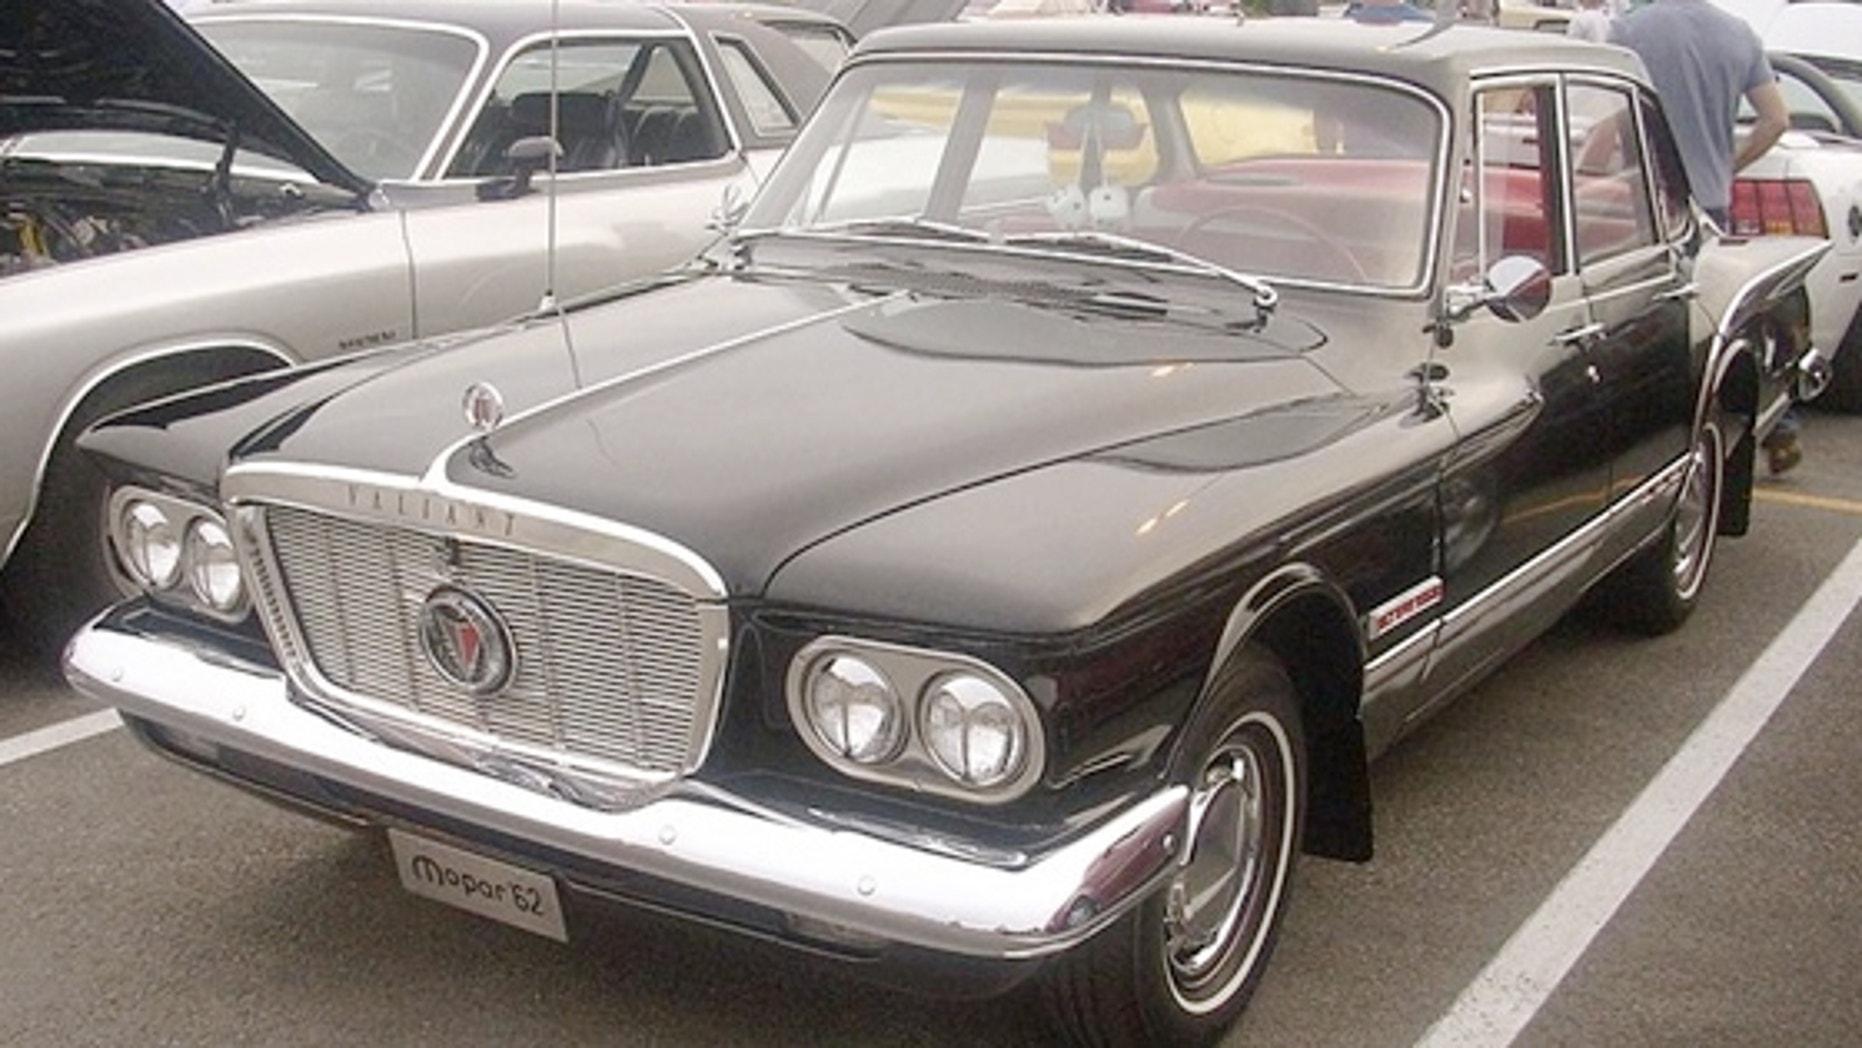 1962 Plymouth Valiant Sedan